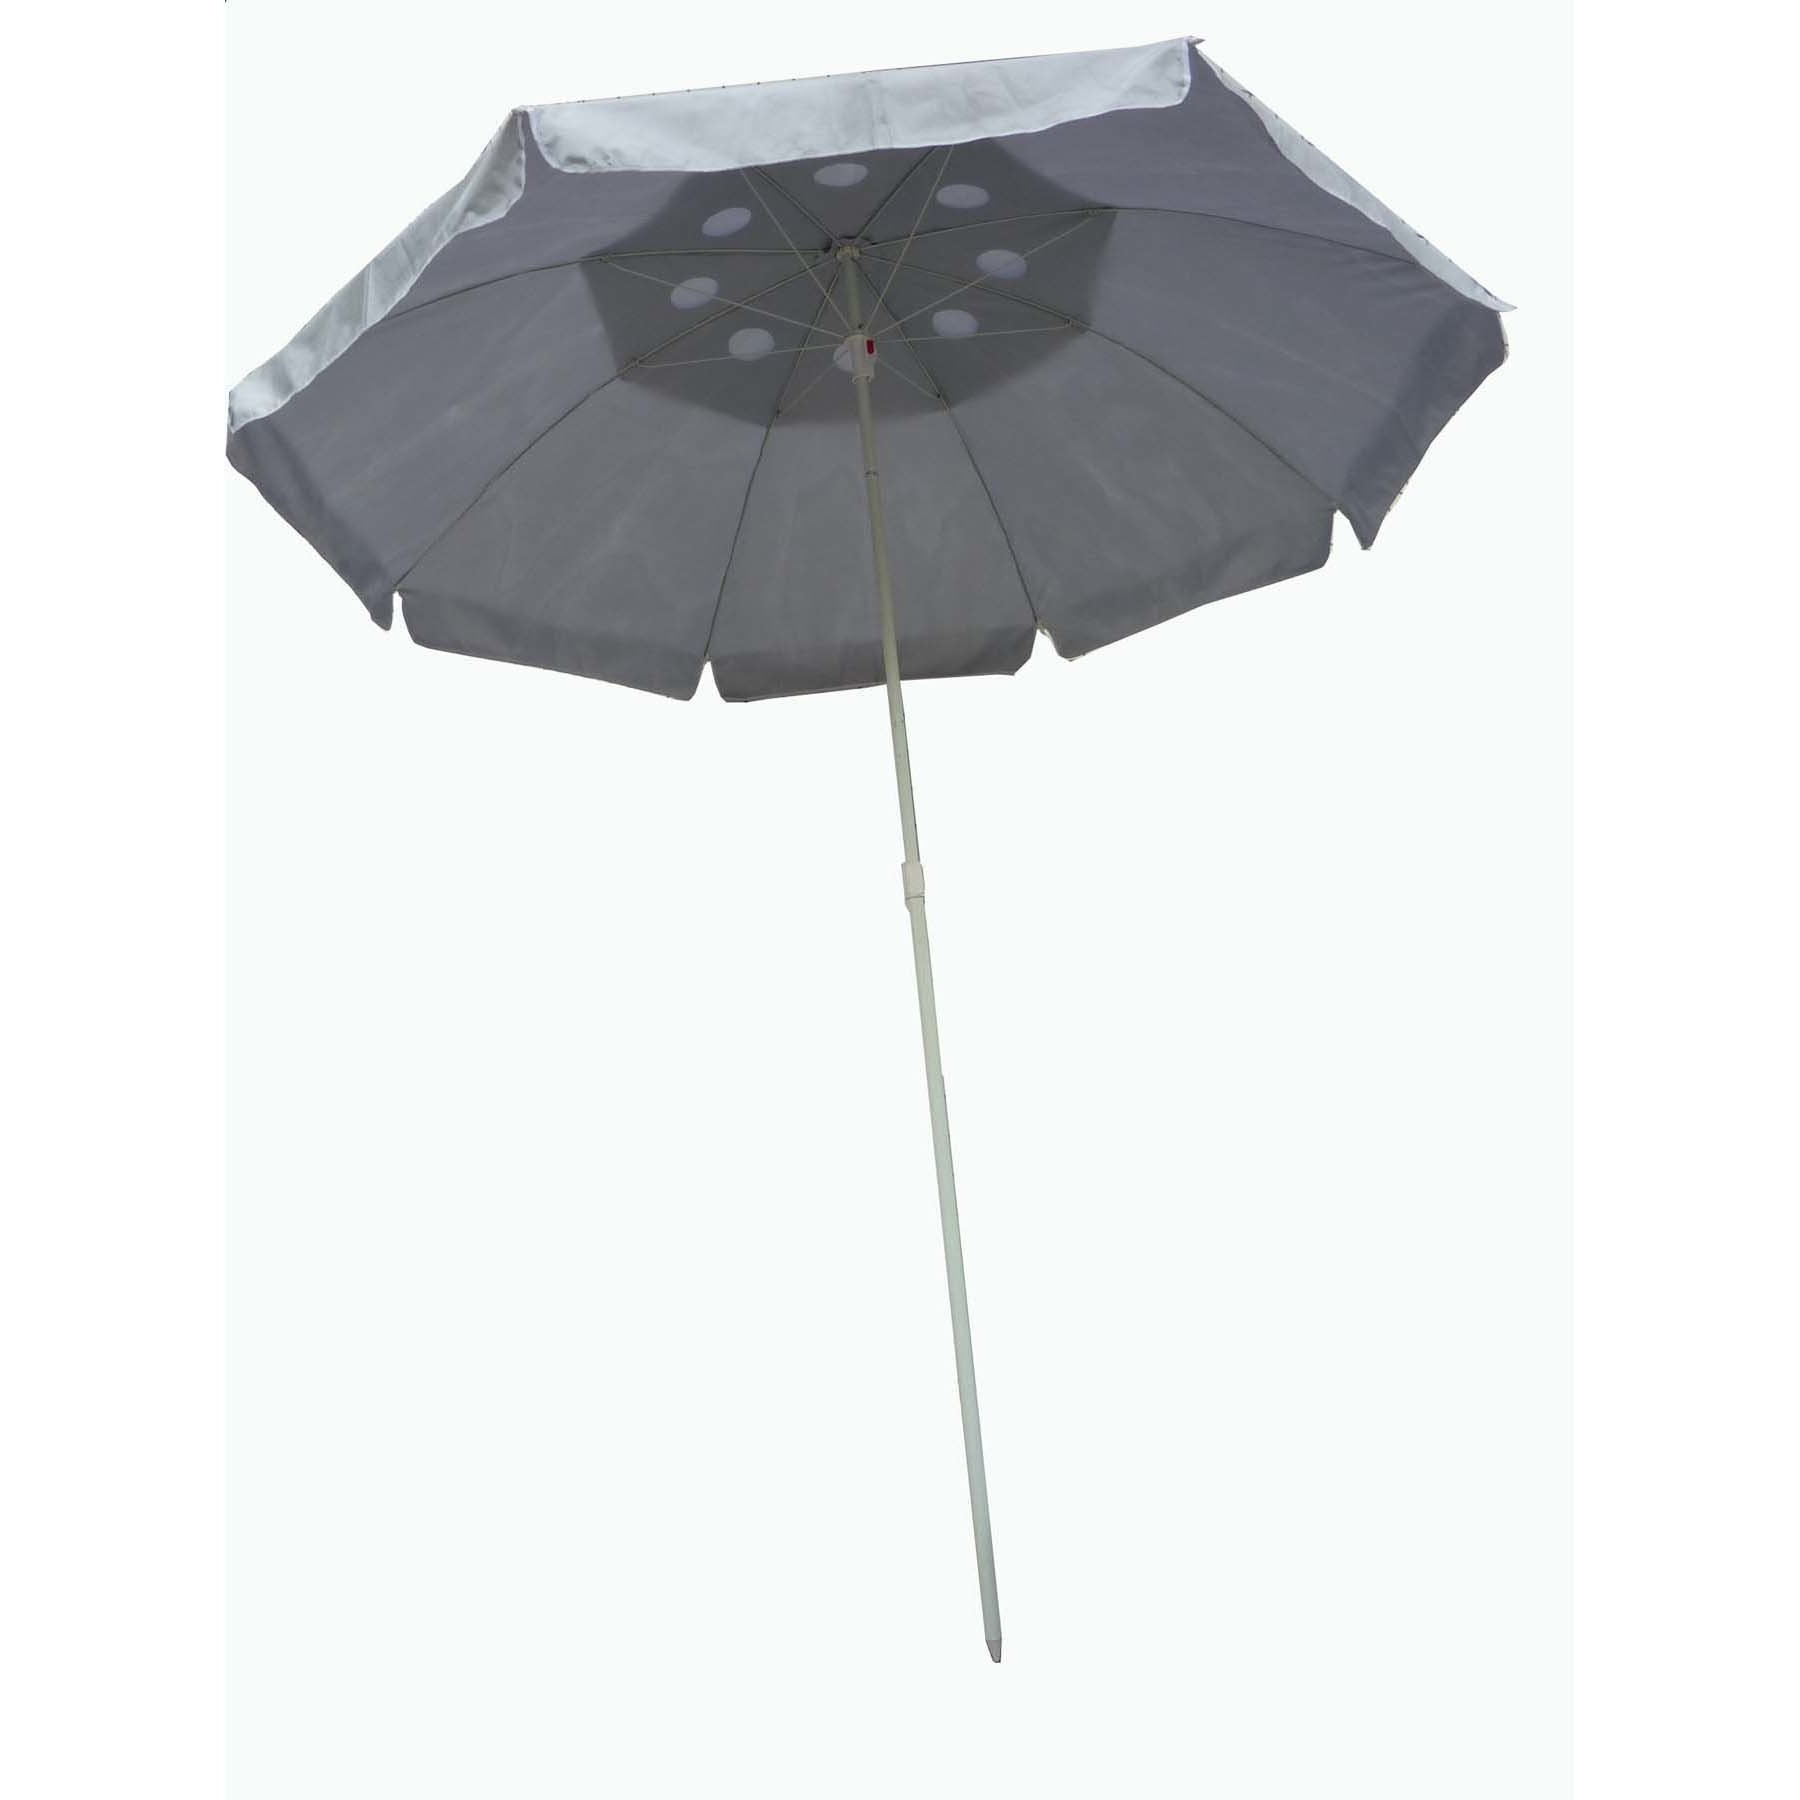 Alyson Joeshade Beach Umbrellas In Most Current 6' Beach Umbrella (View 2 of 20)